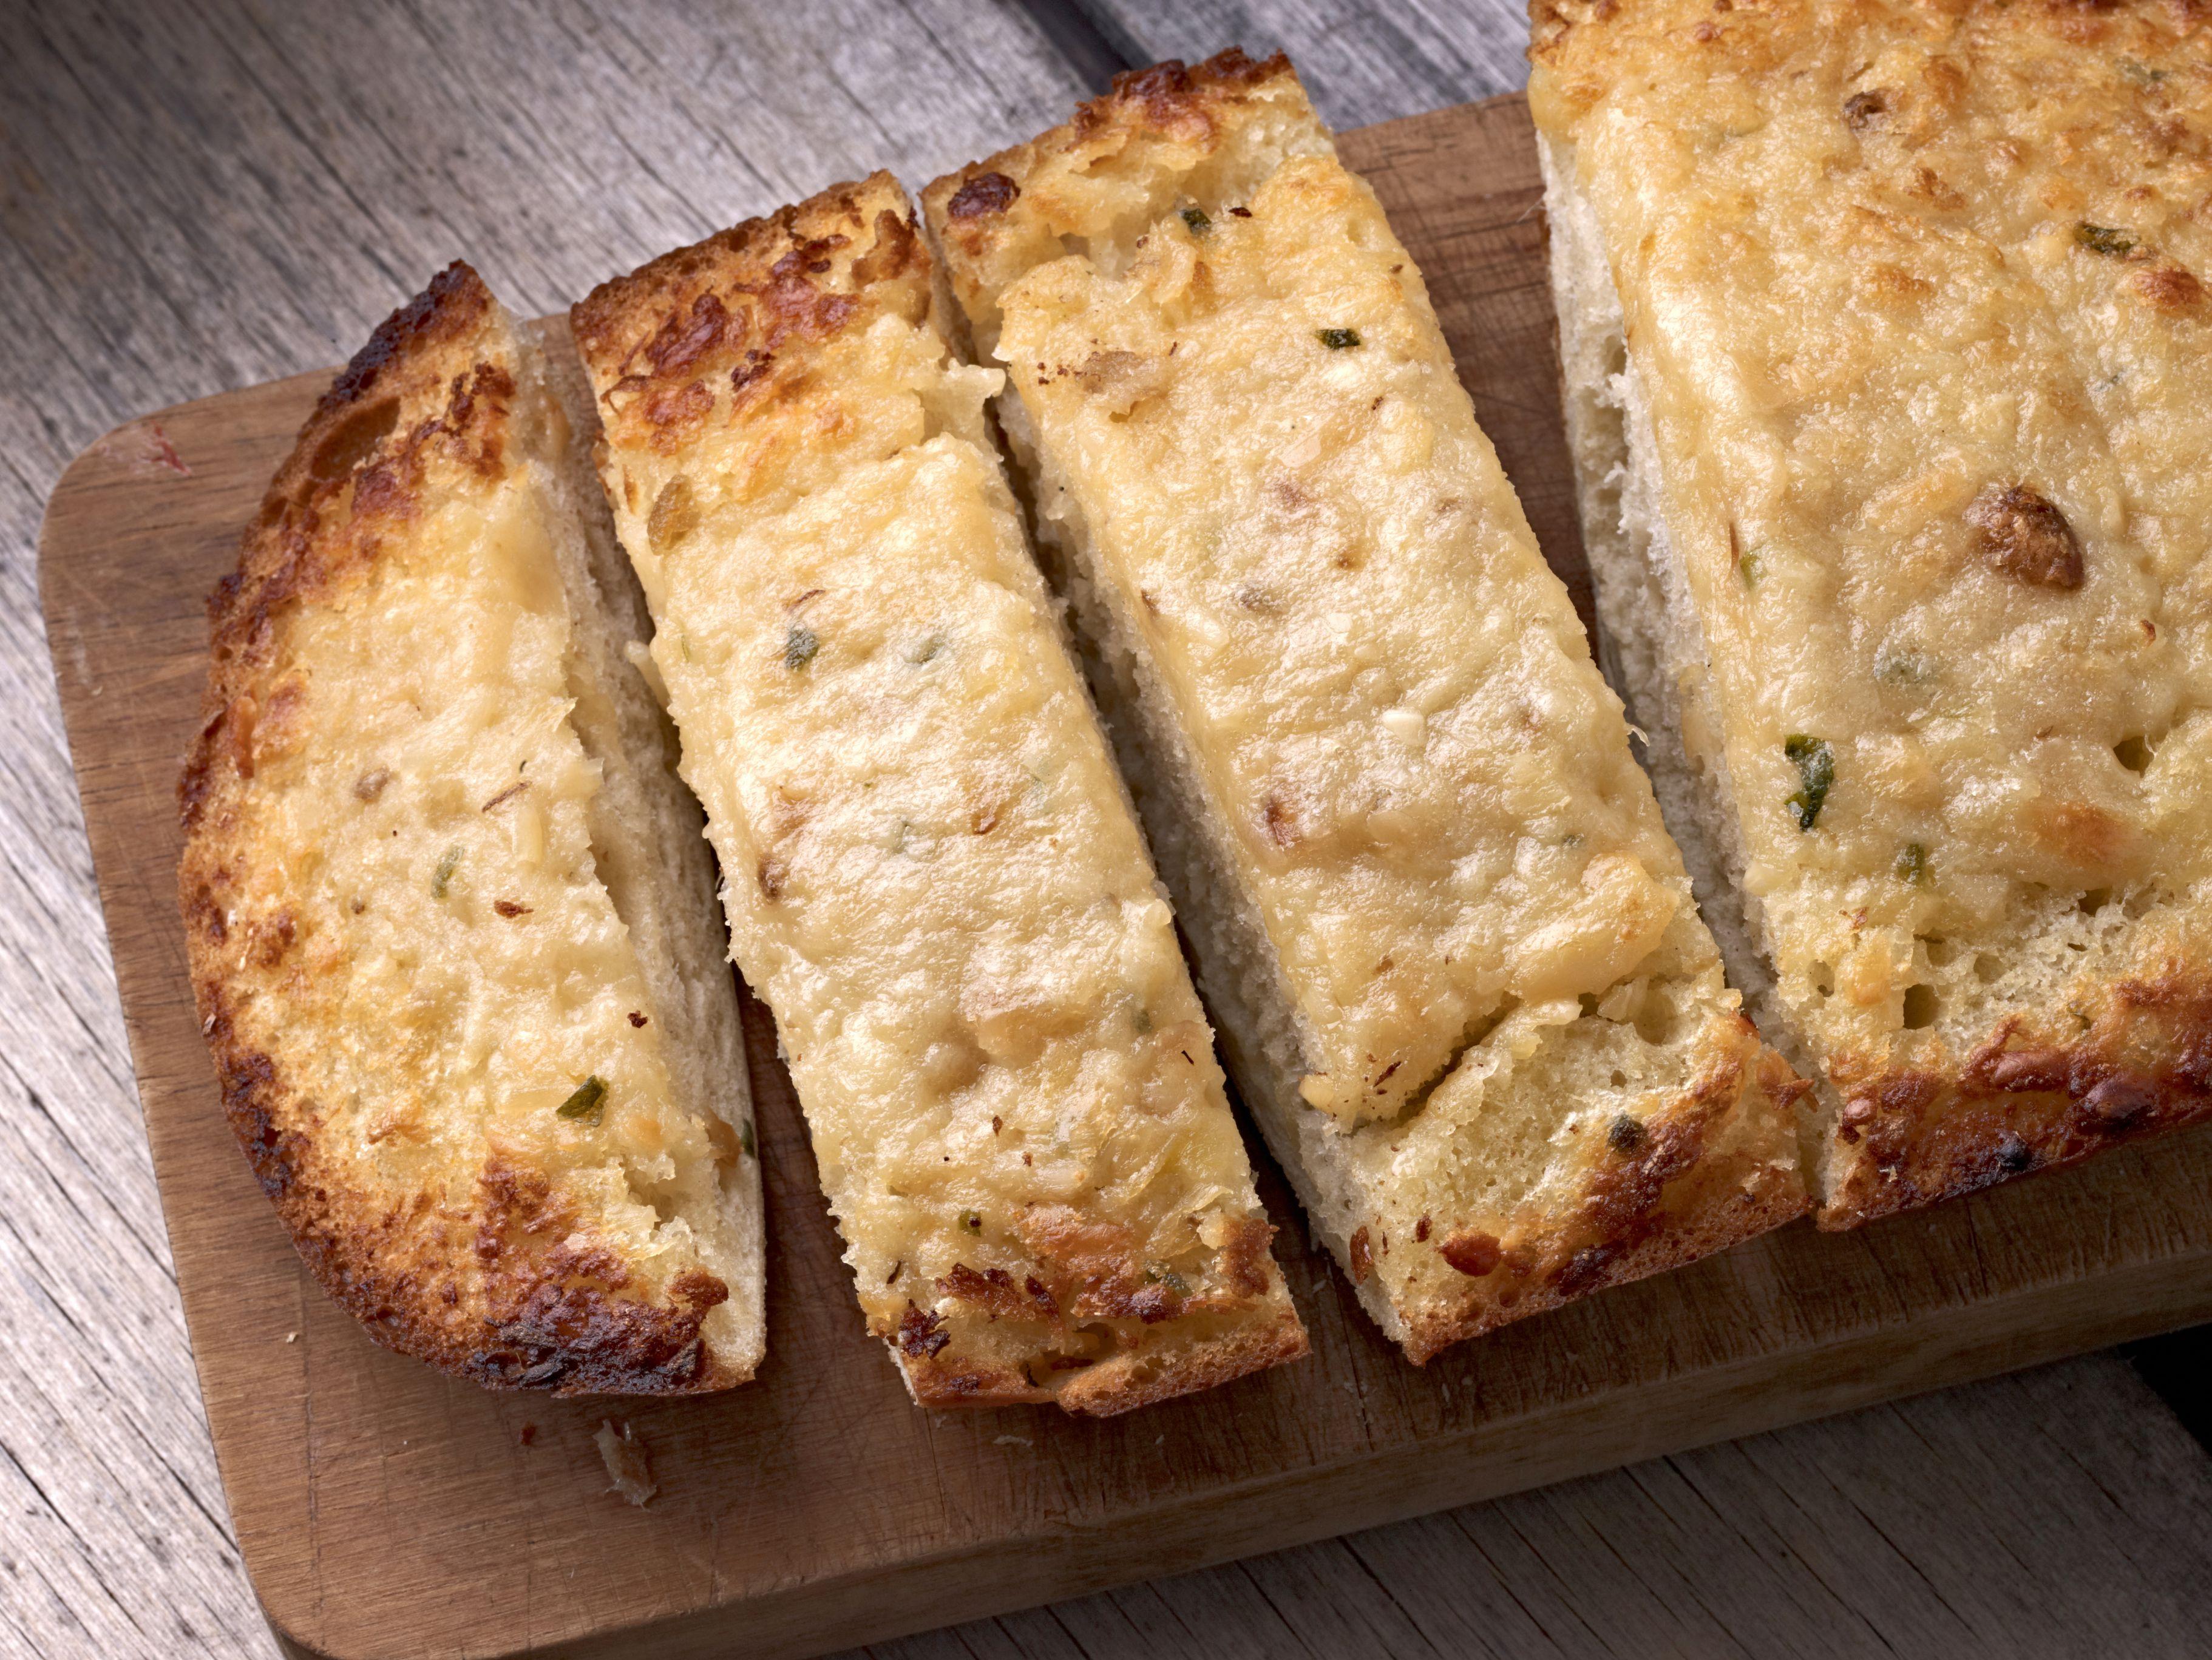 Toasted Parmesan Garlic Bread